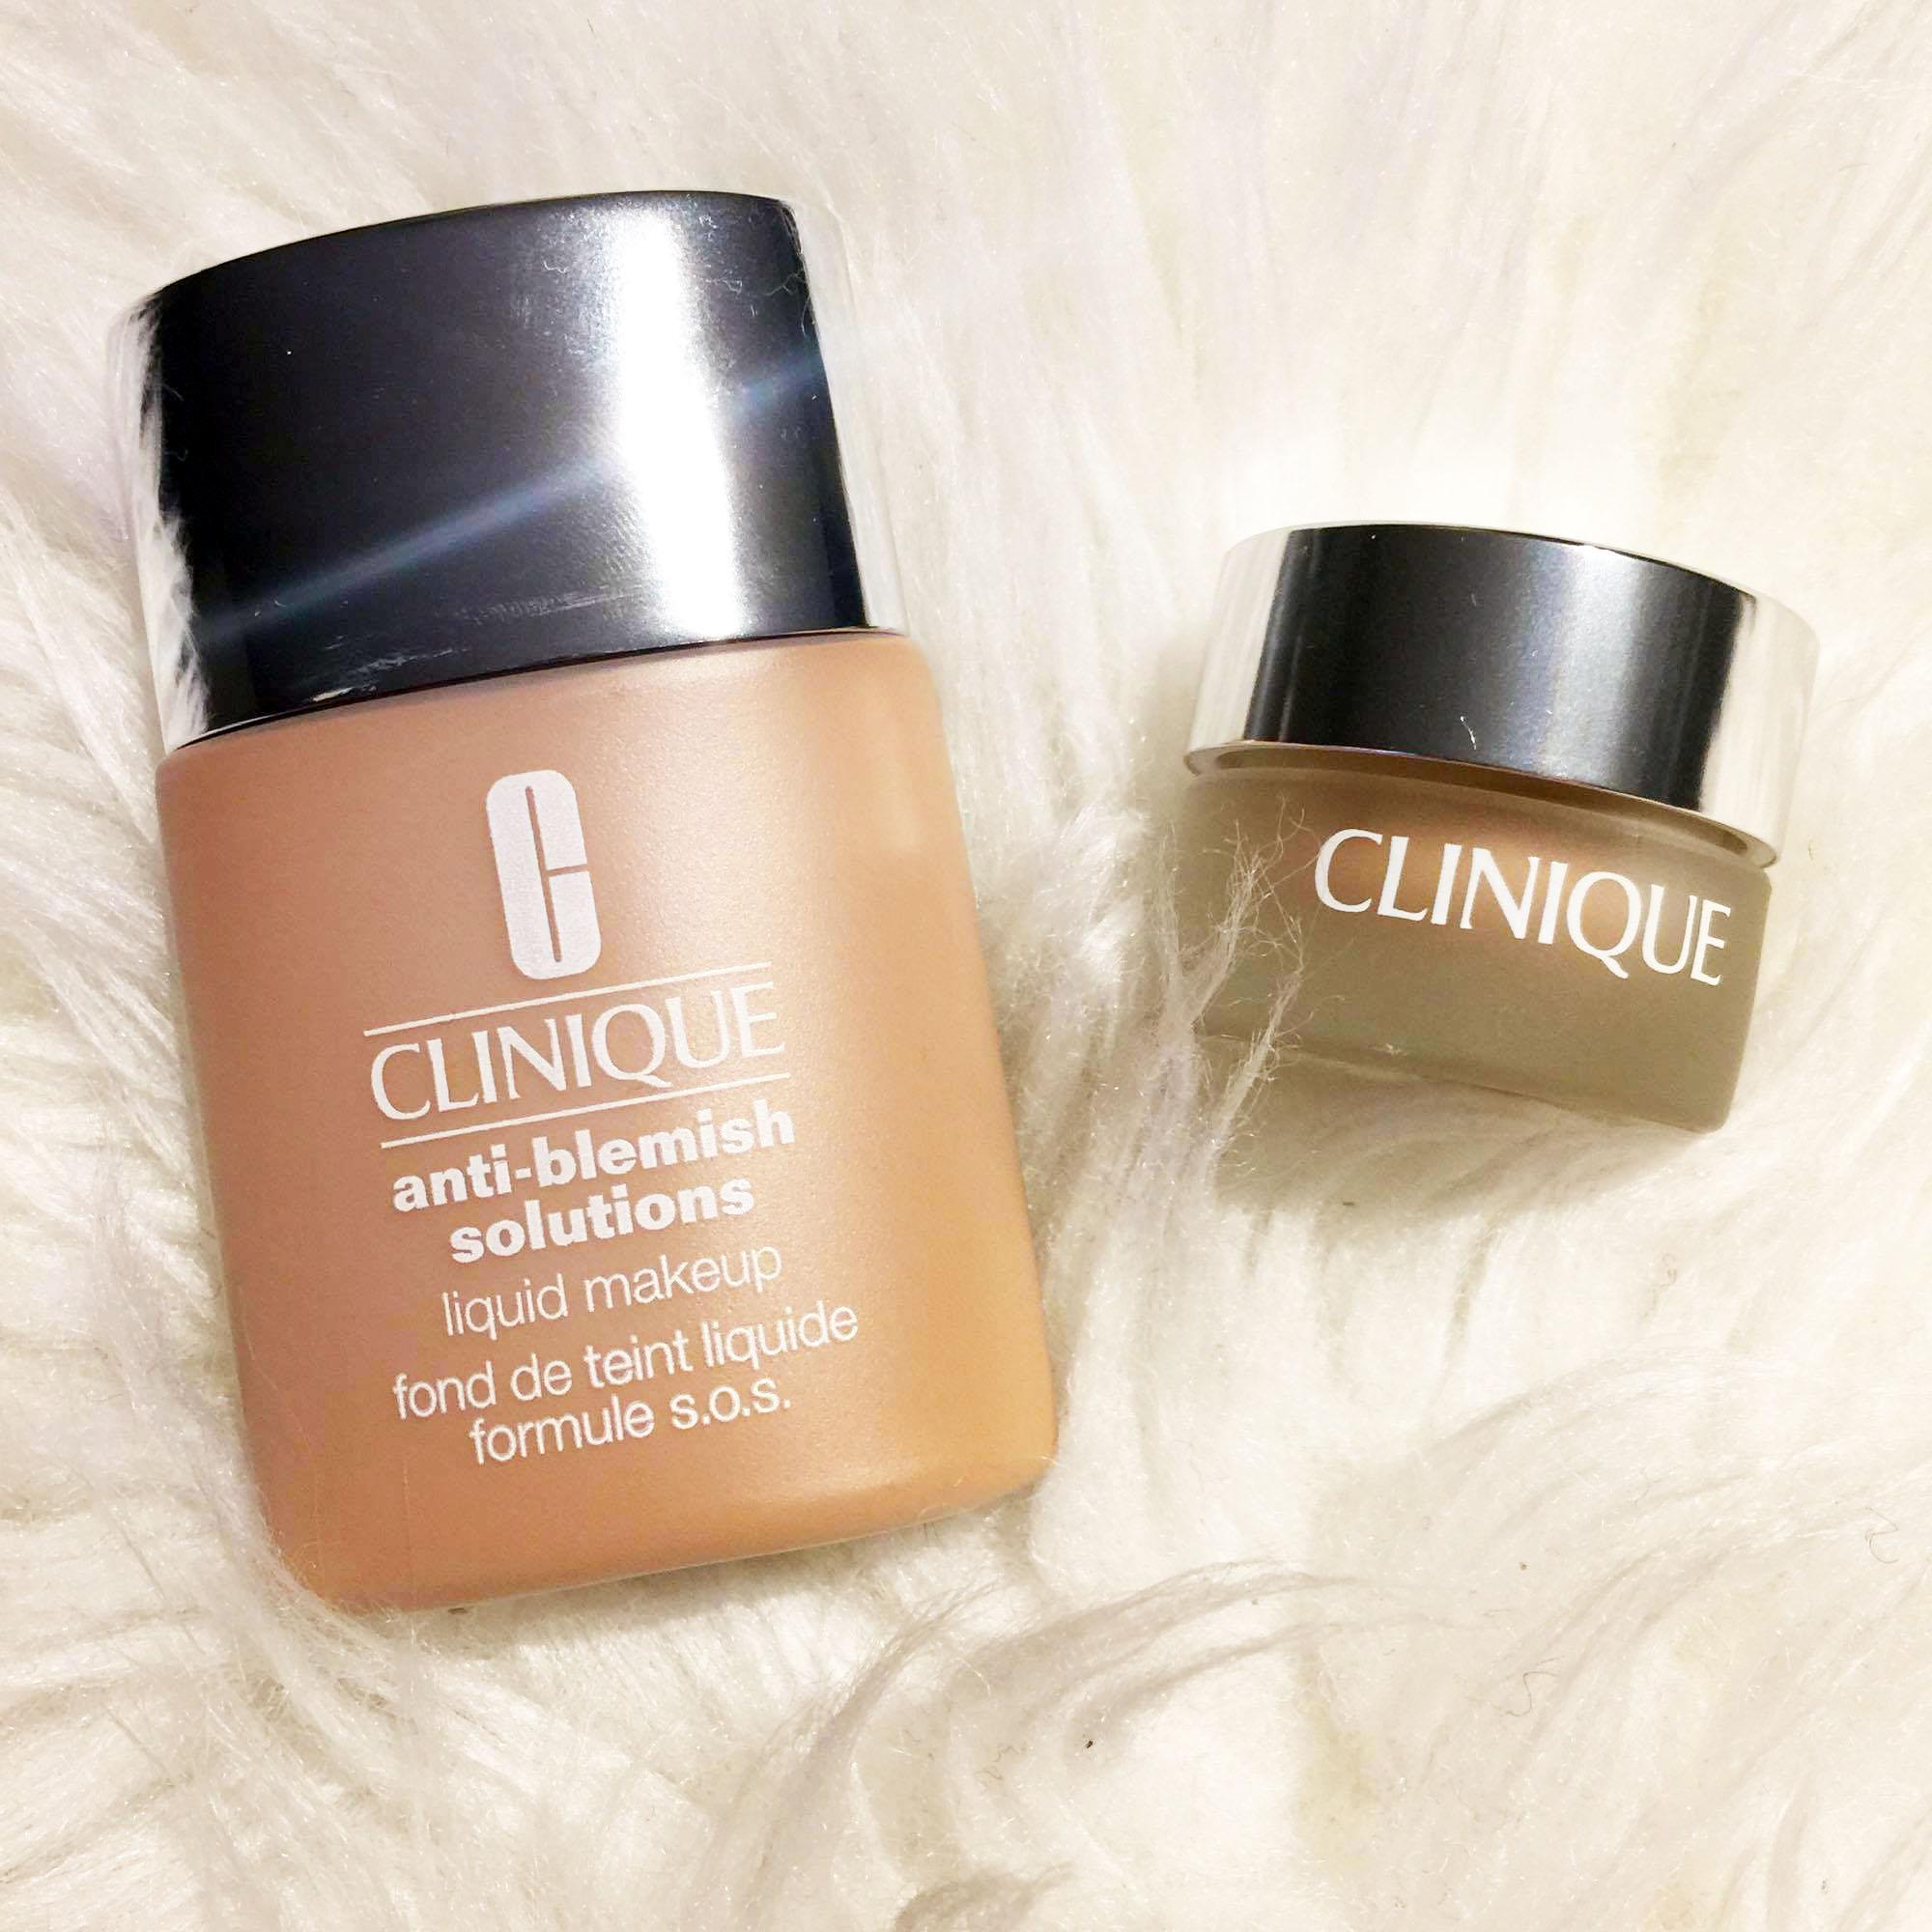 Clinique Anti-blemish Solution Liquid Makeup